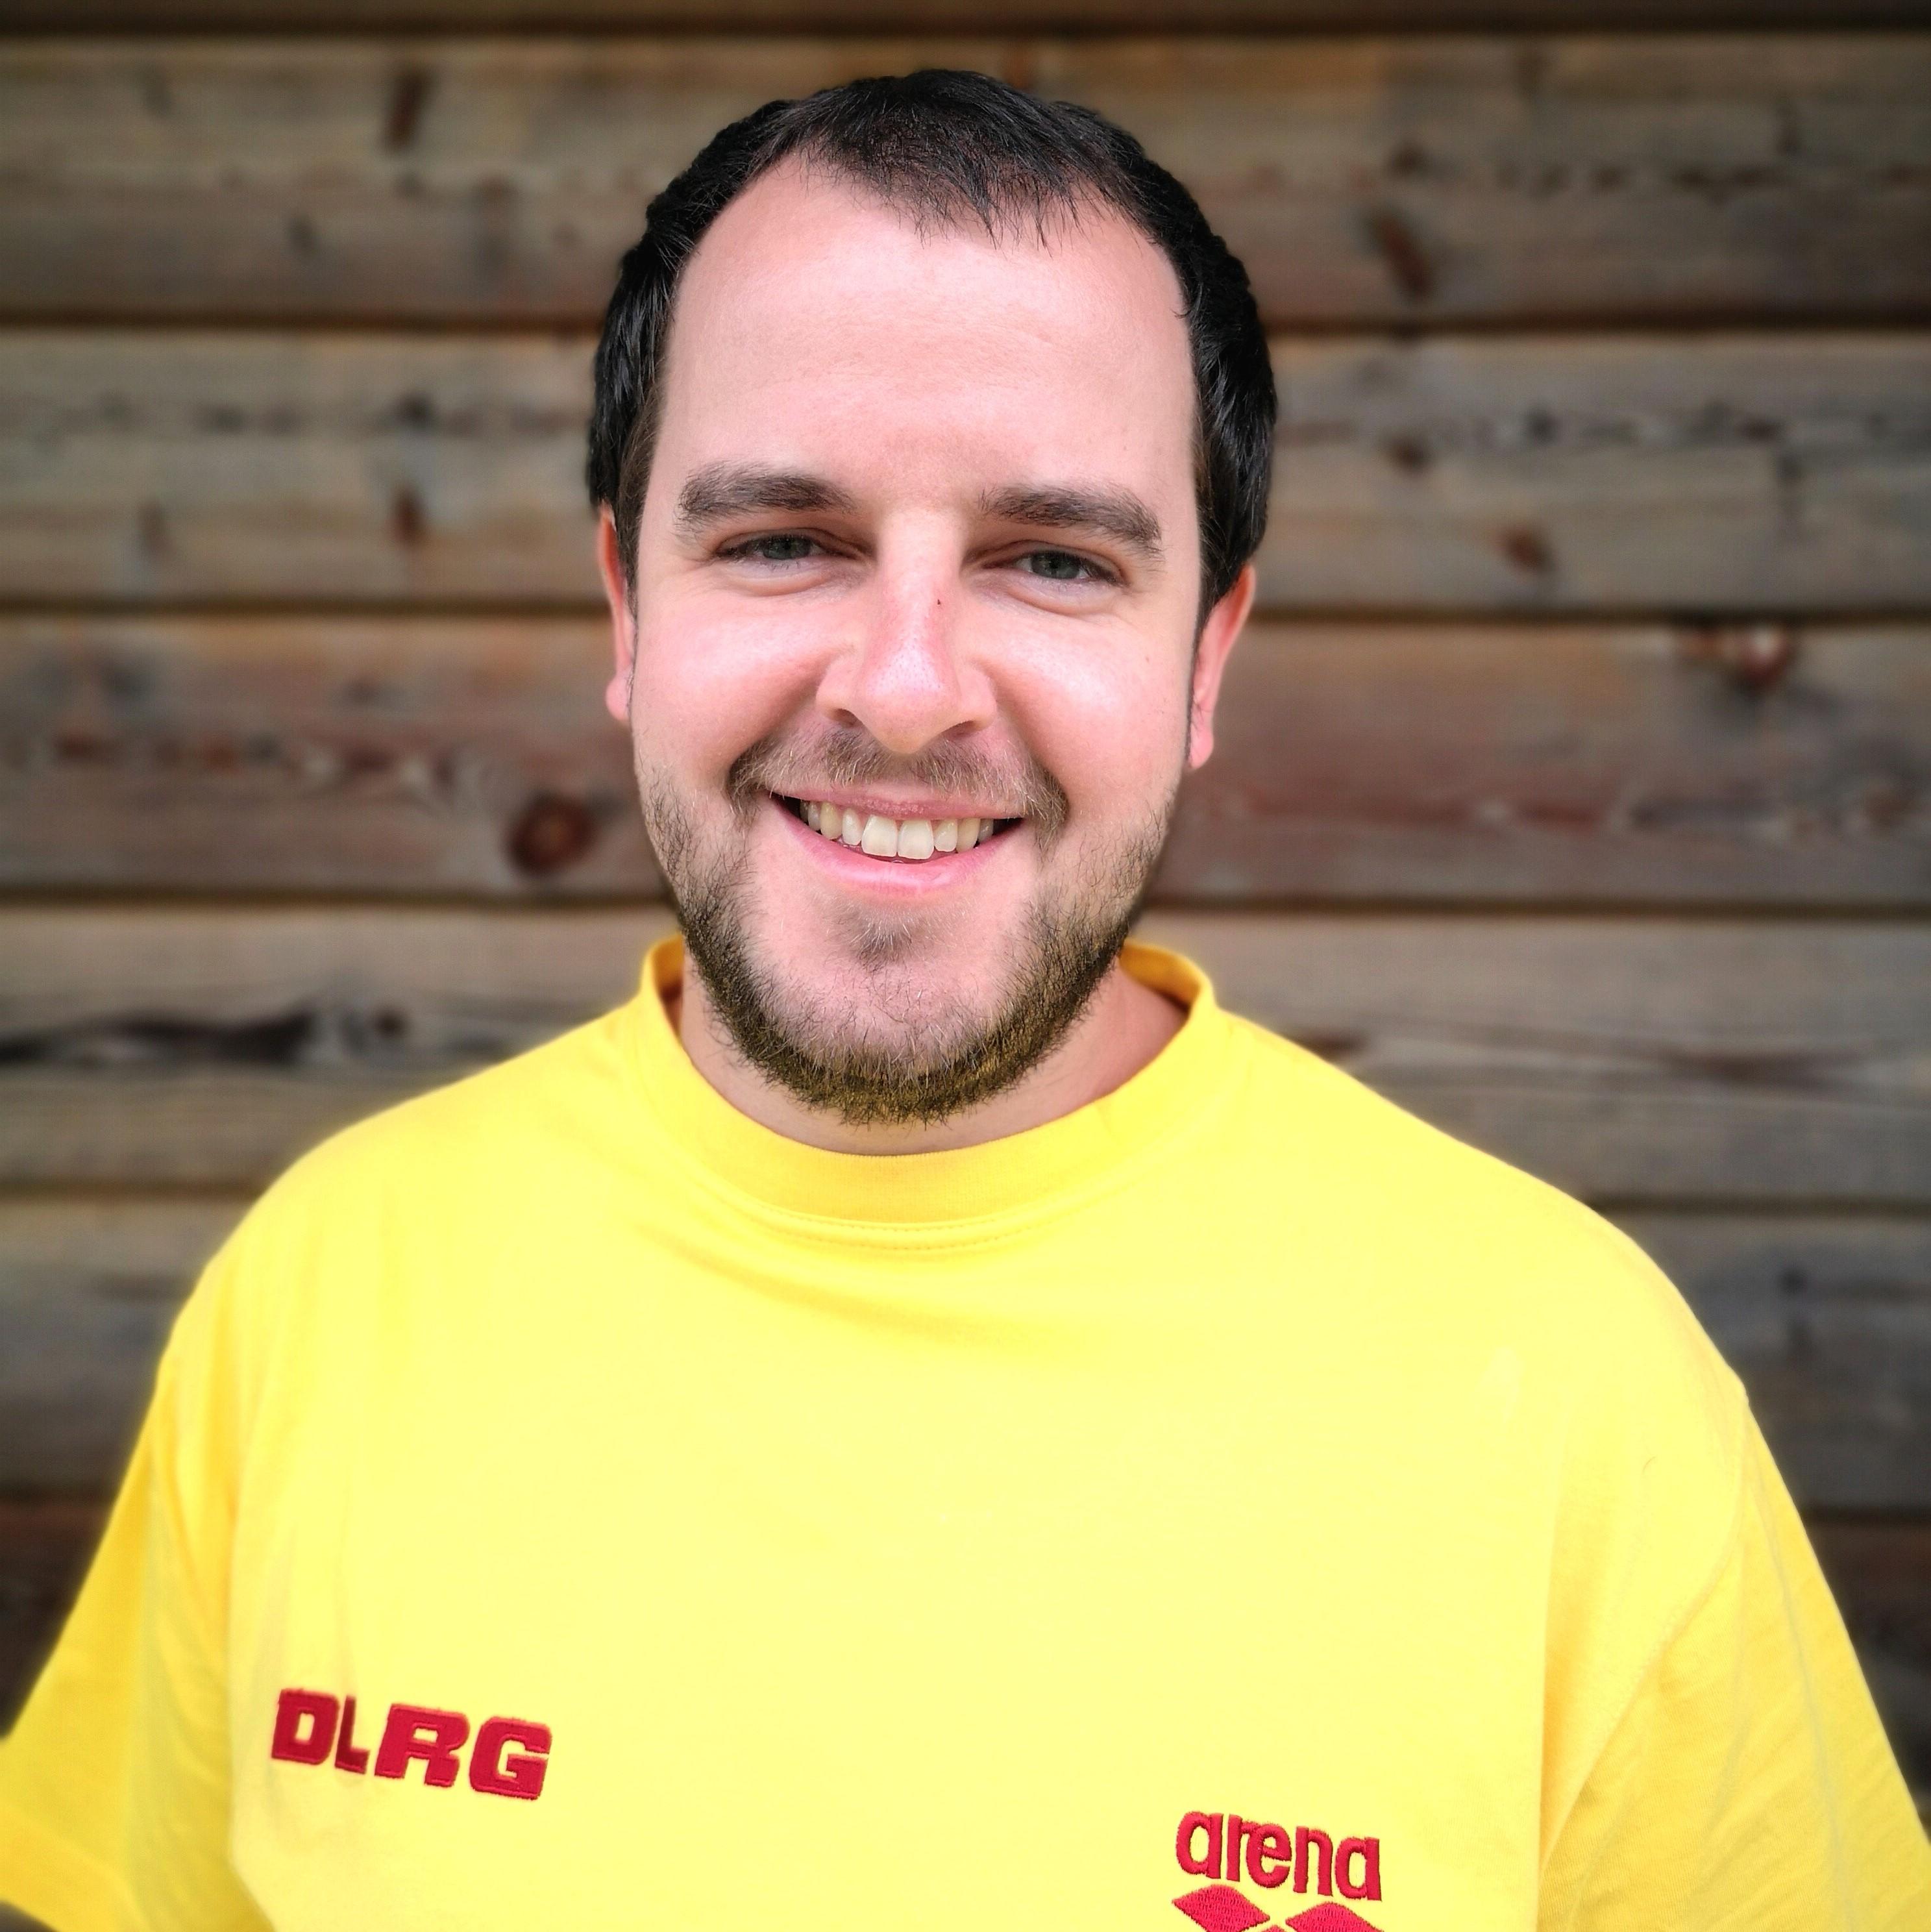 Profilbild Martin Maier